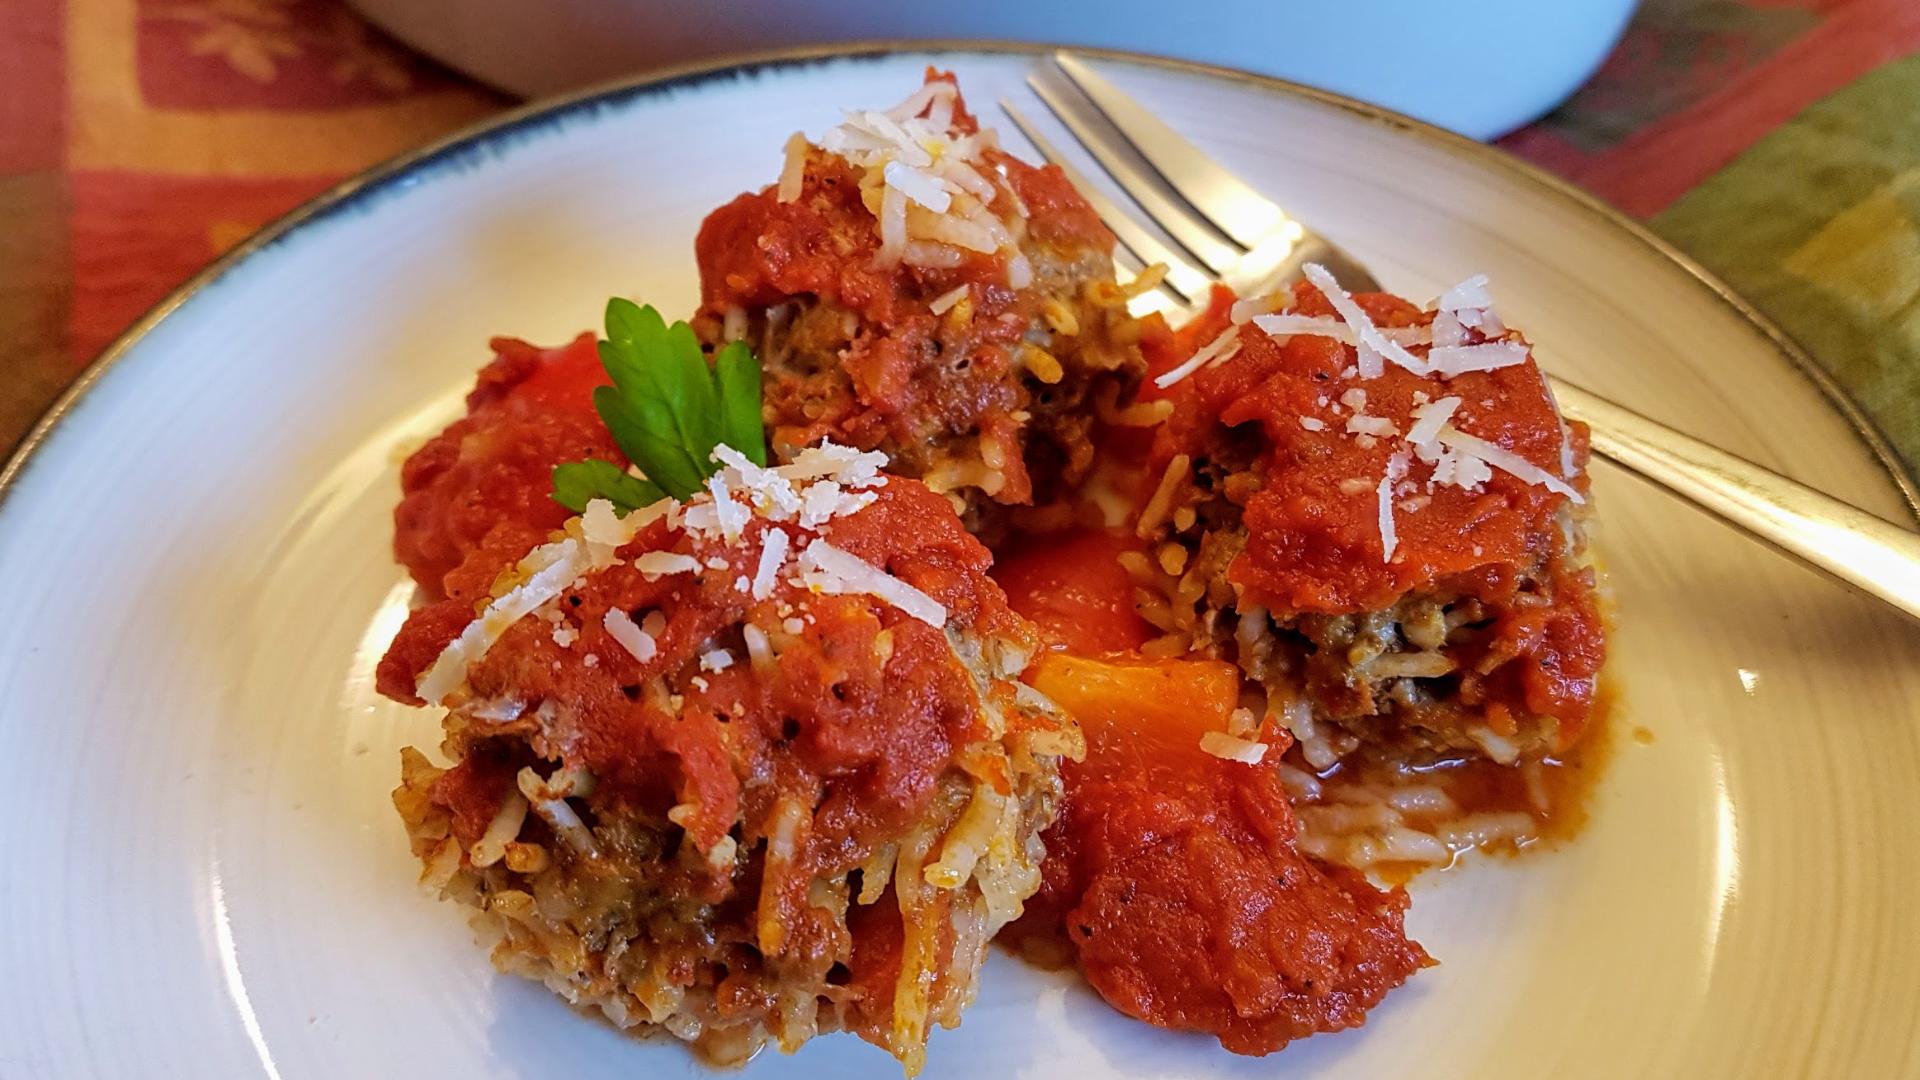 Porcupine meatballs on a plate